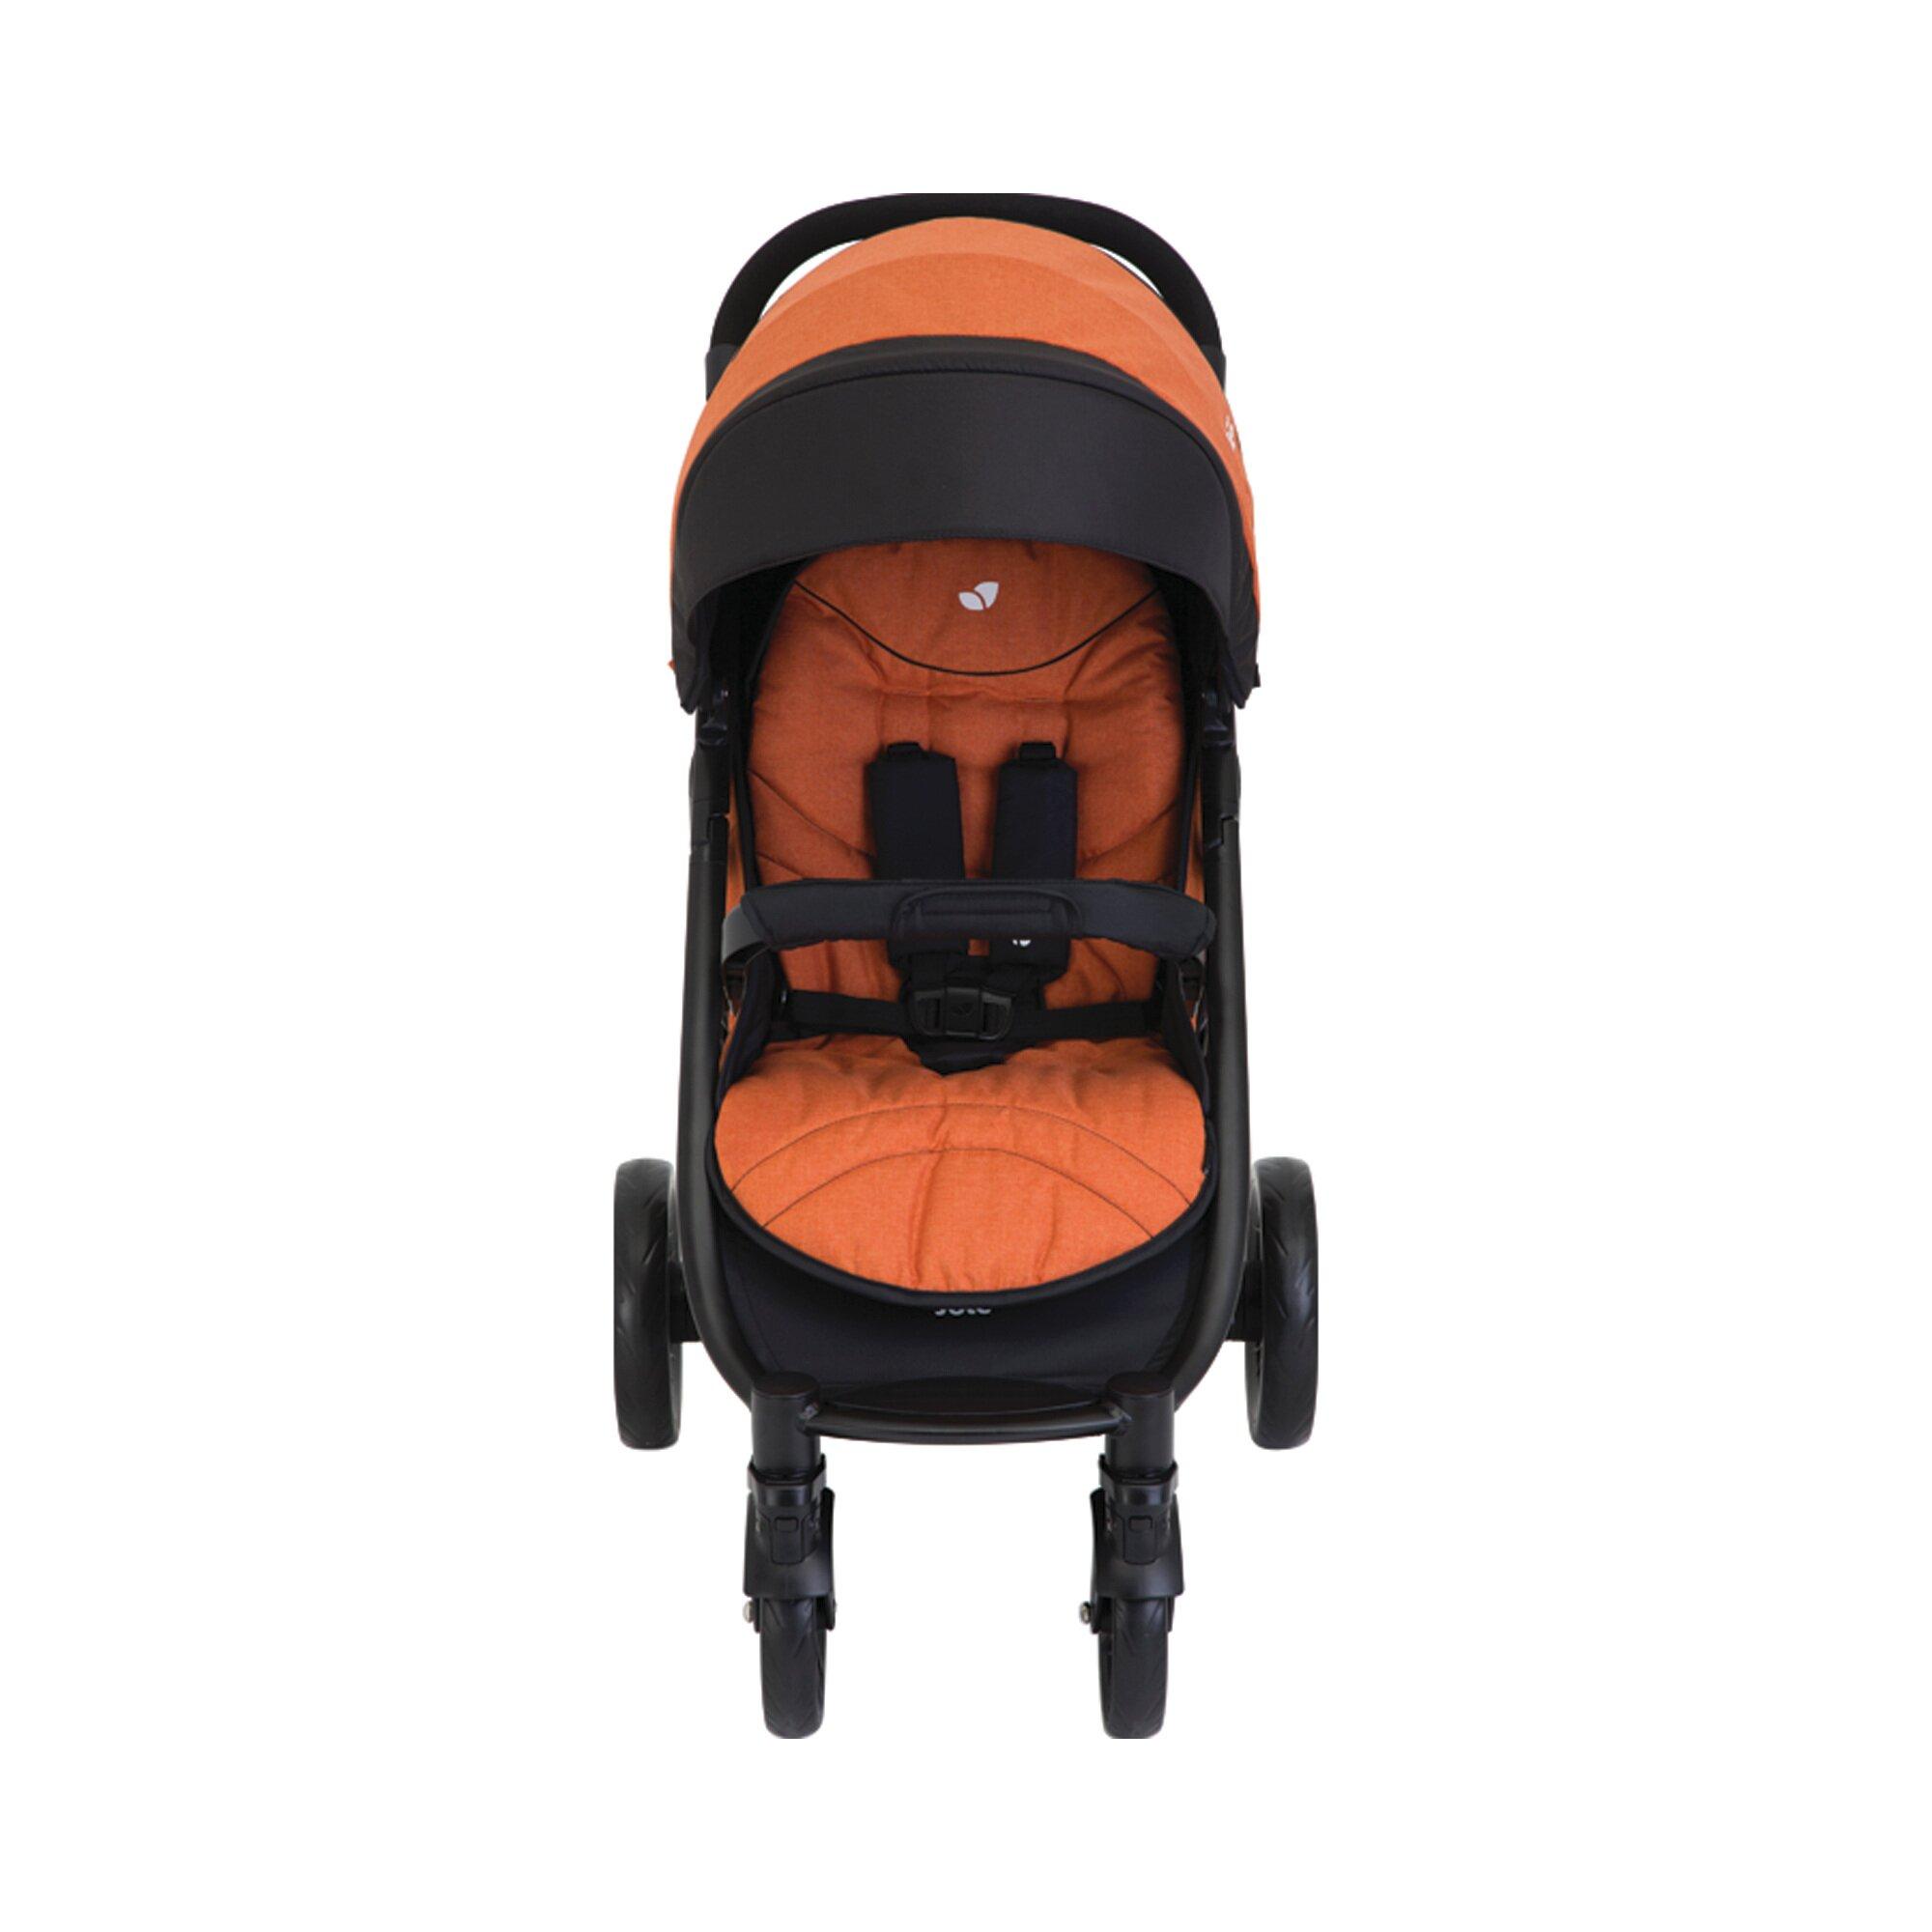 joie-buggy-litetrax-4-design-2016-orange, 151.99 EUR @ babywalz-de